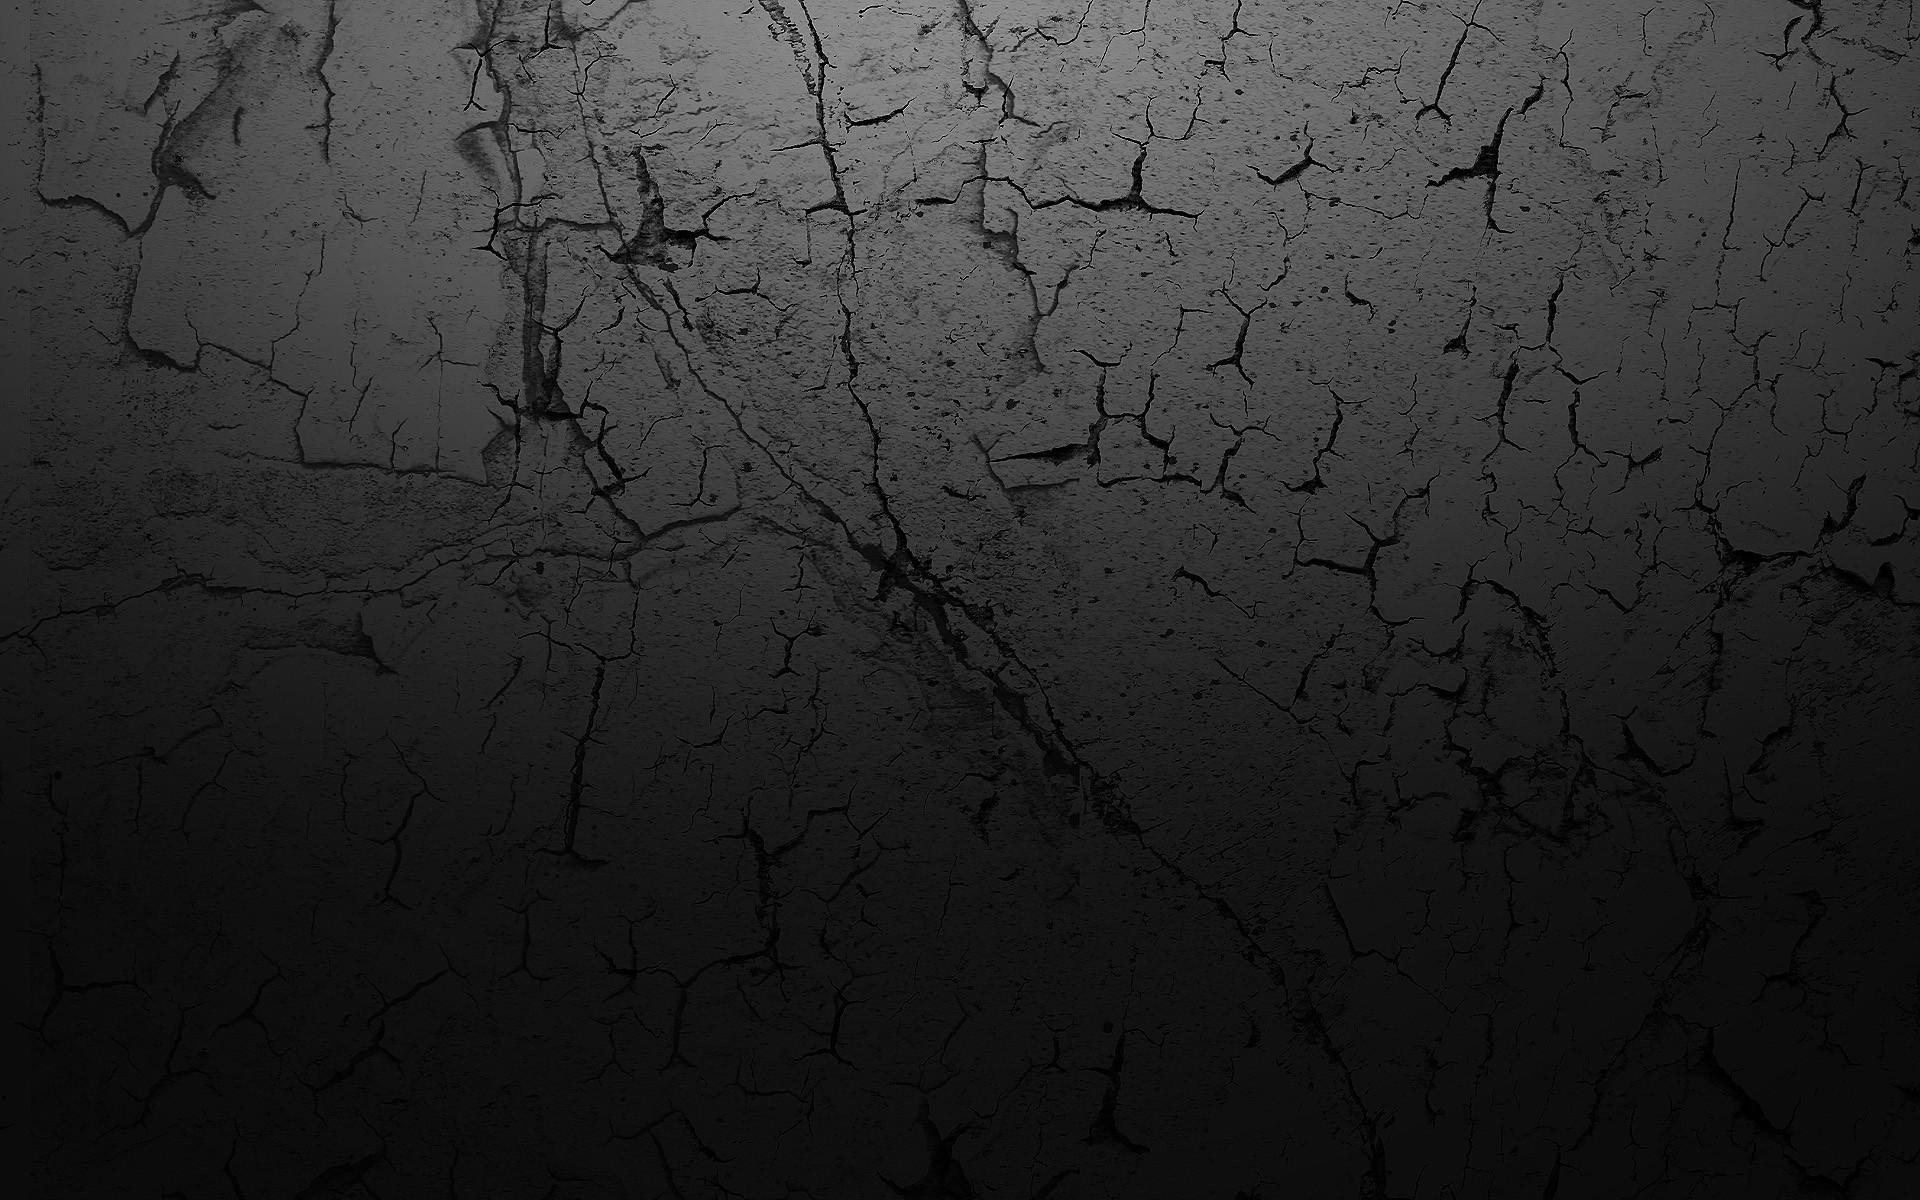 jagodunya-texture-wall-cracks-creative-background-wallpaper.jpg (